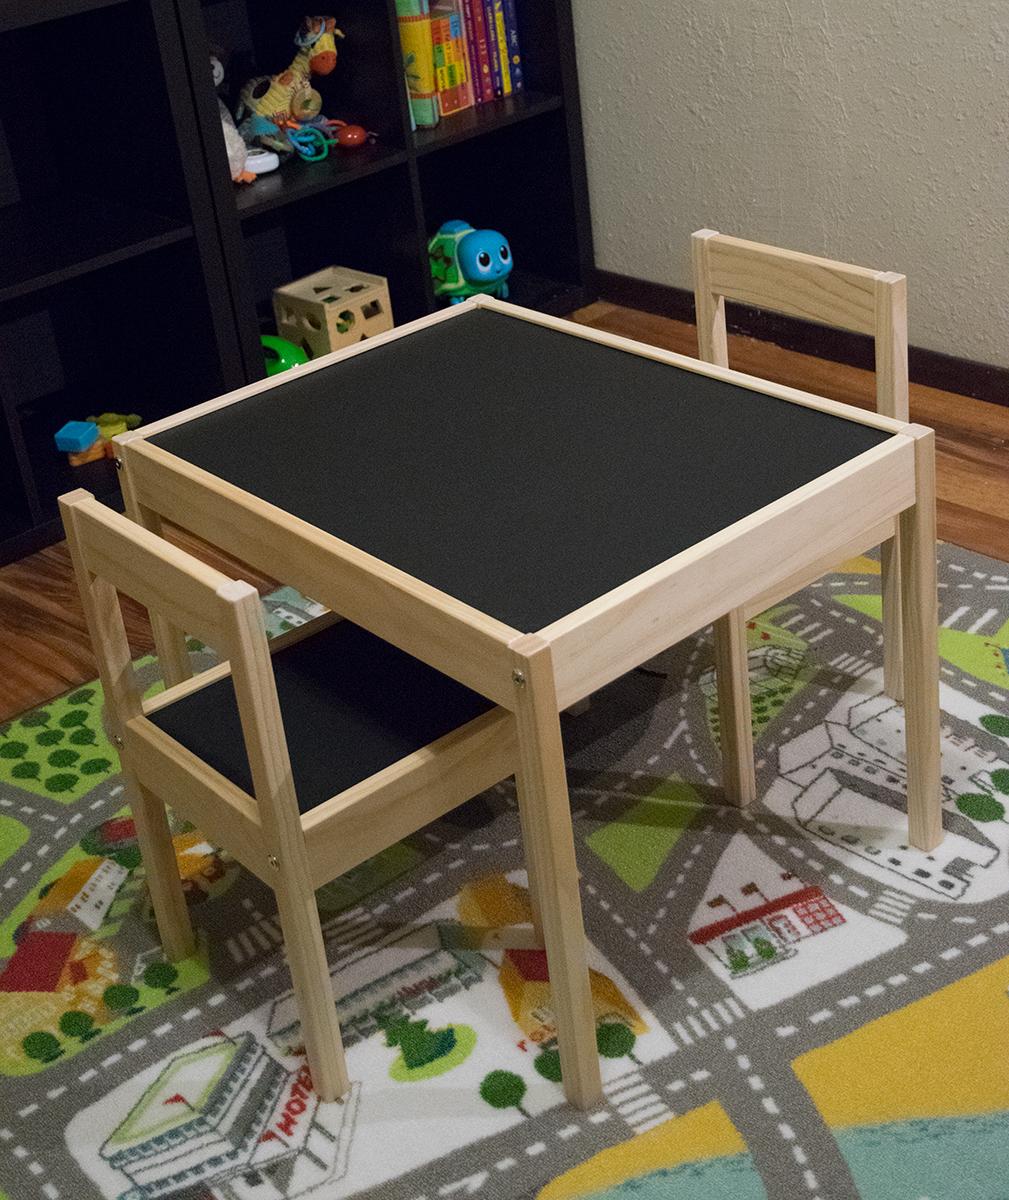 Playroom remodel making a space kid friendly